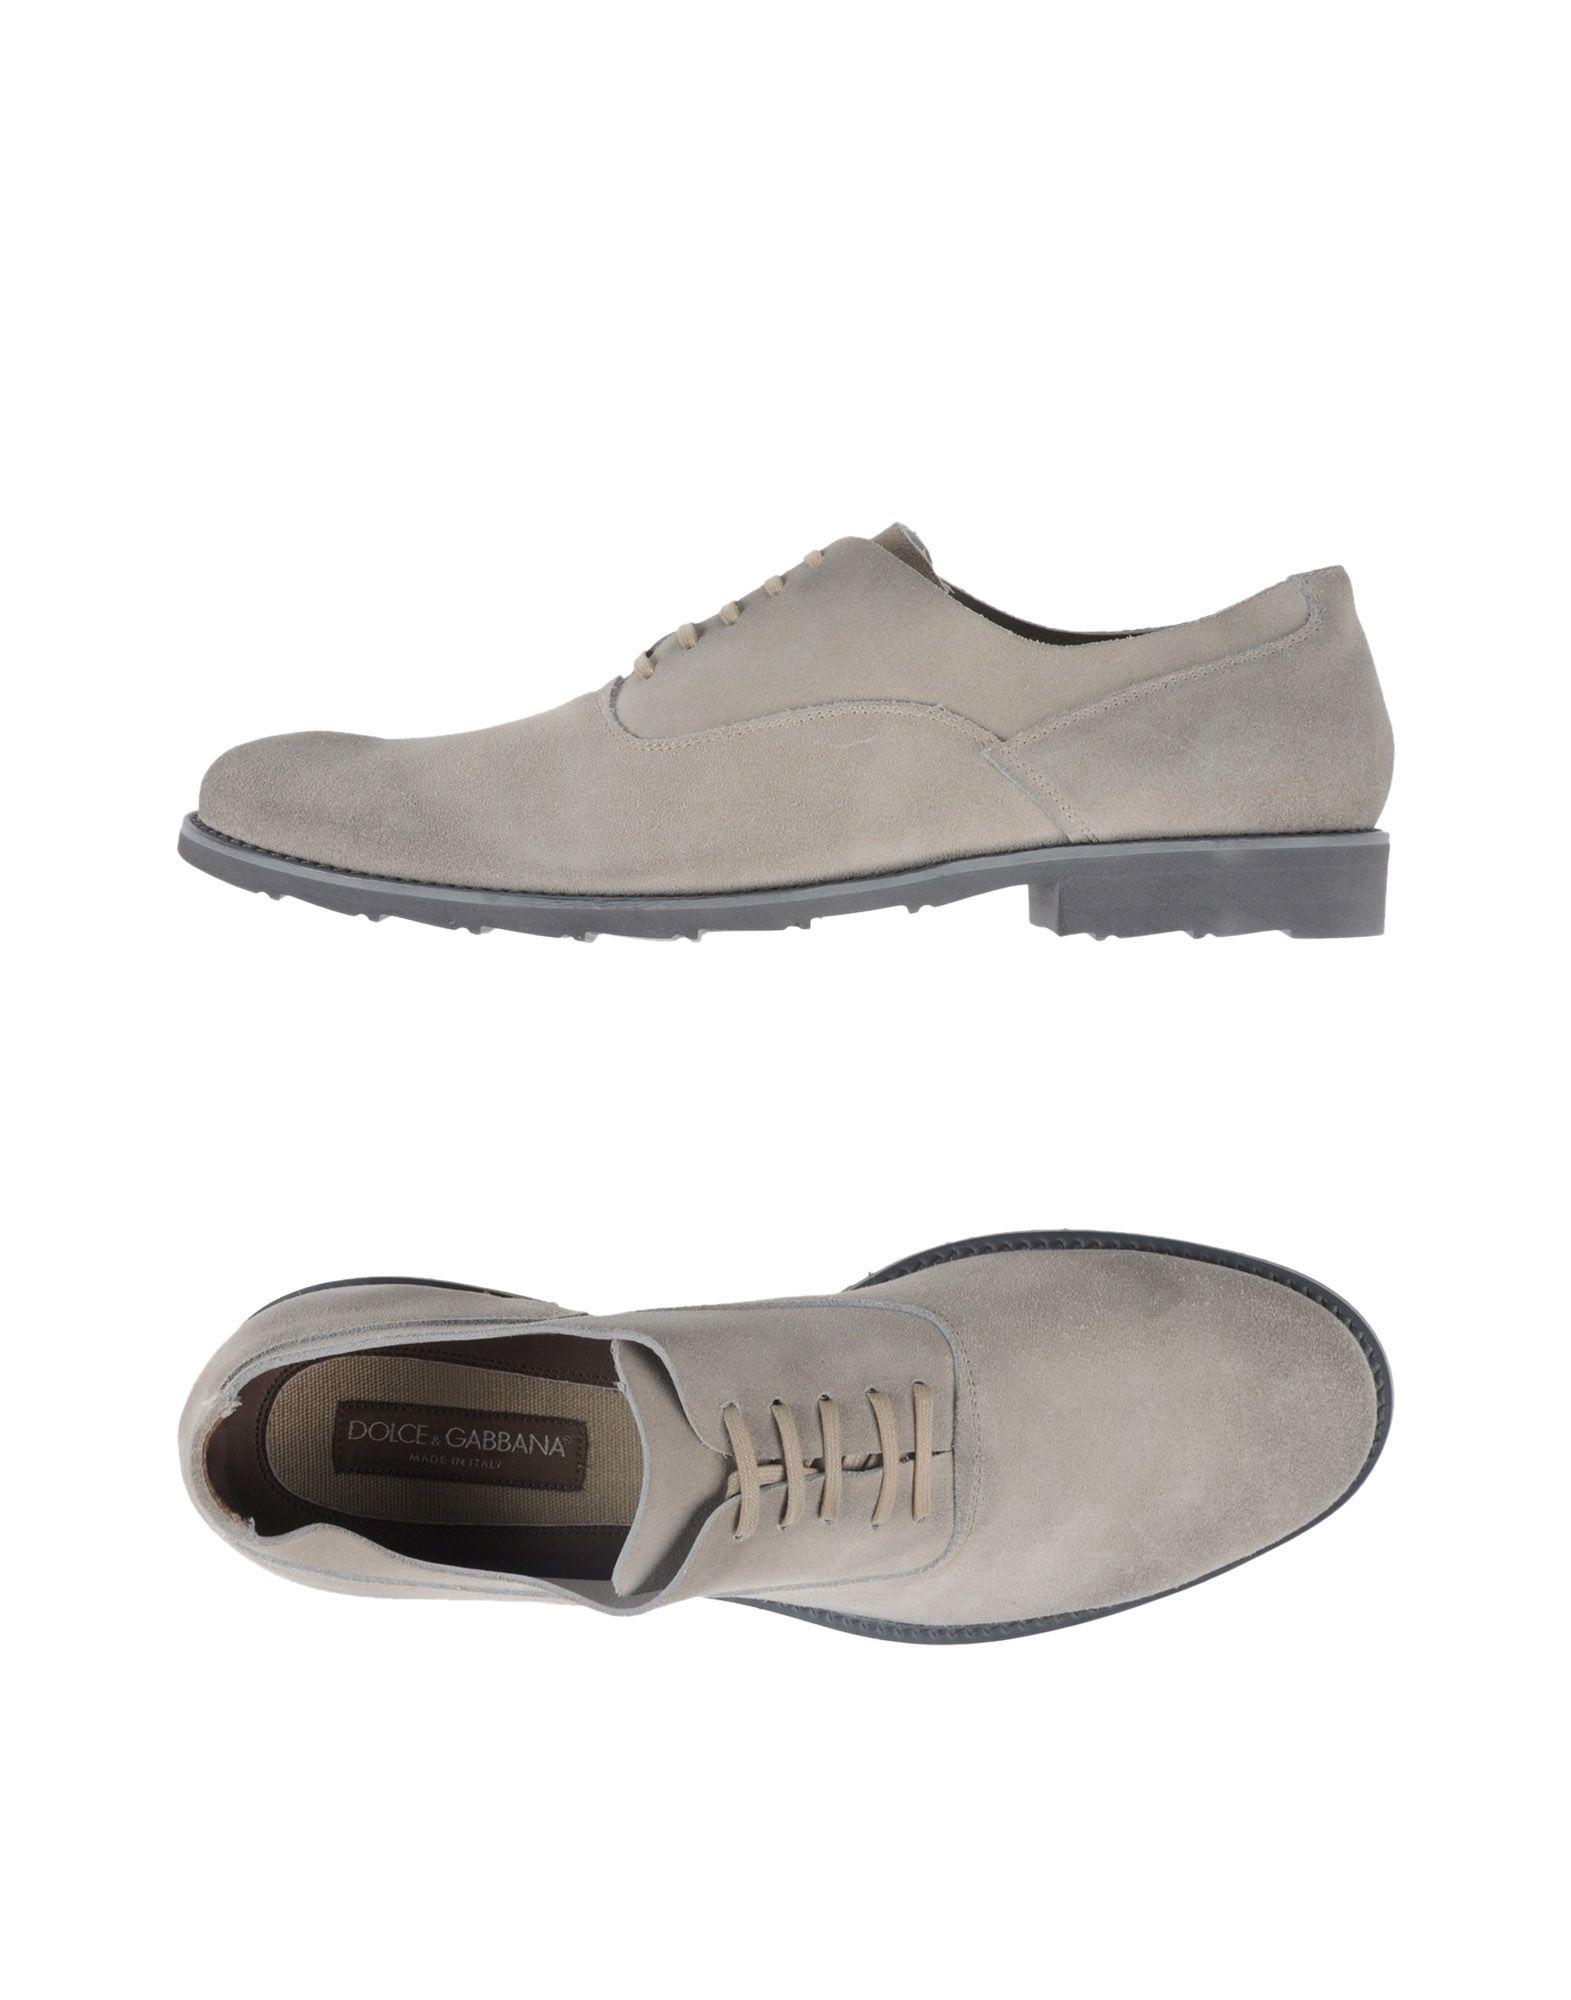 Фото - DOLCE & GABBANA Обувь на шнурках обувь на высокой платформе dkny